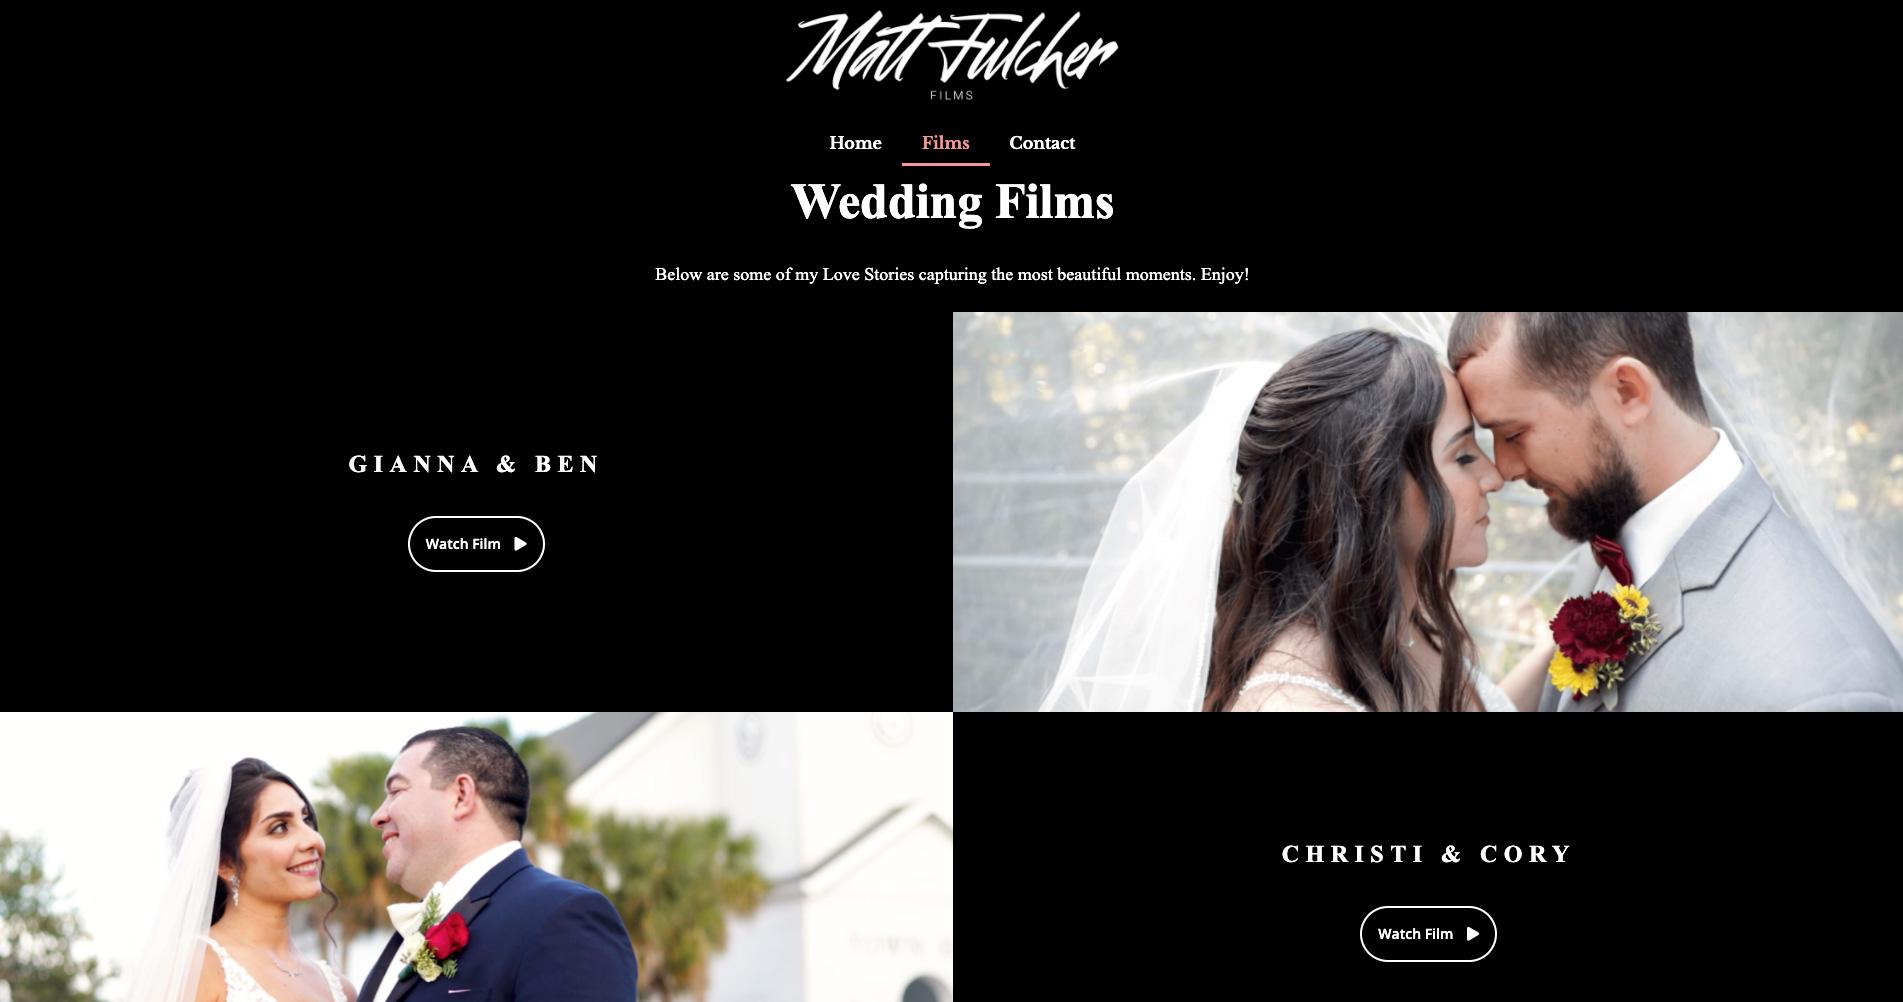 Oseeyo Web Development and Design - Wedding Photographer website - Vero Beach, FL